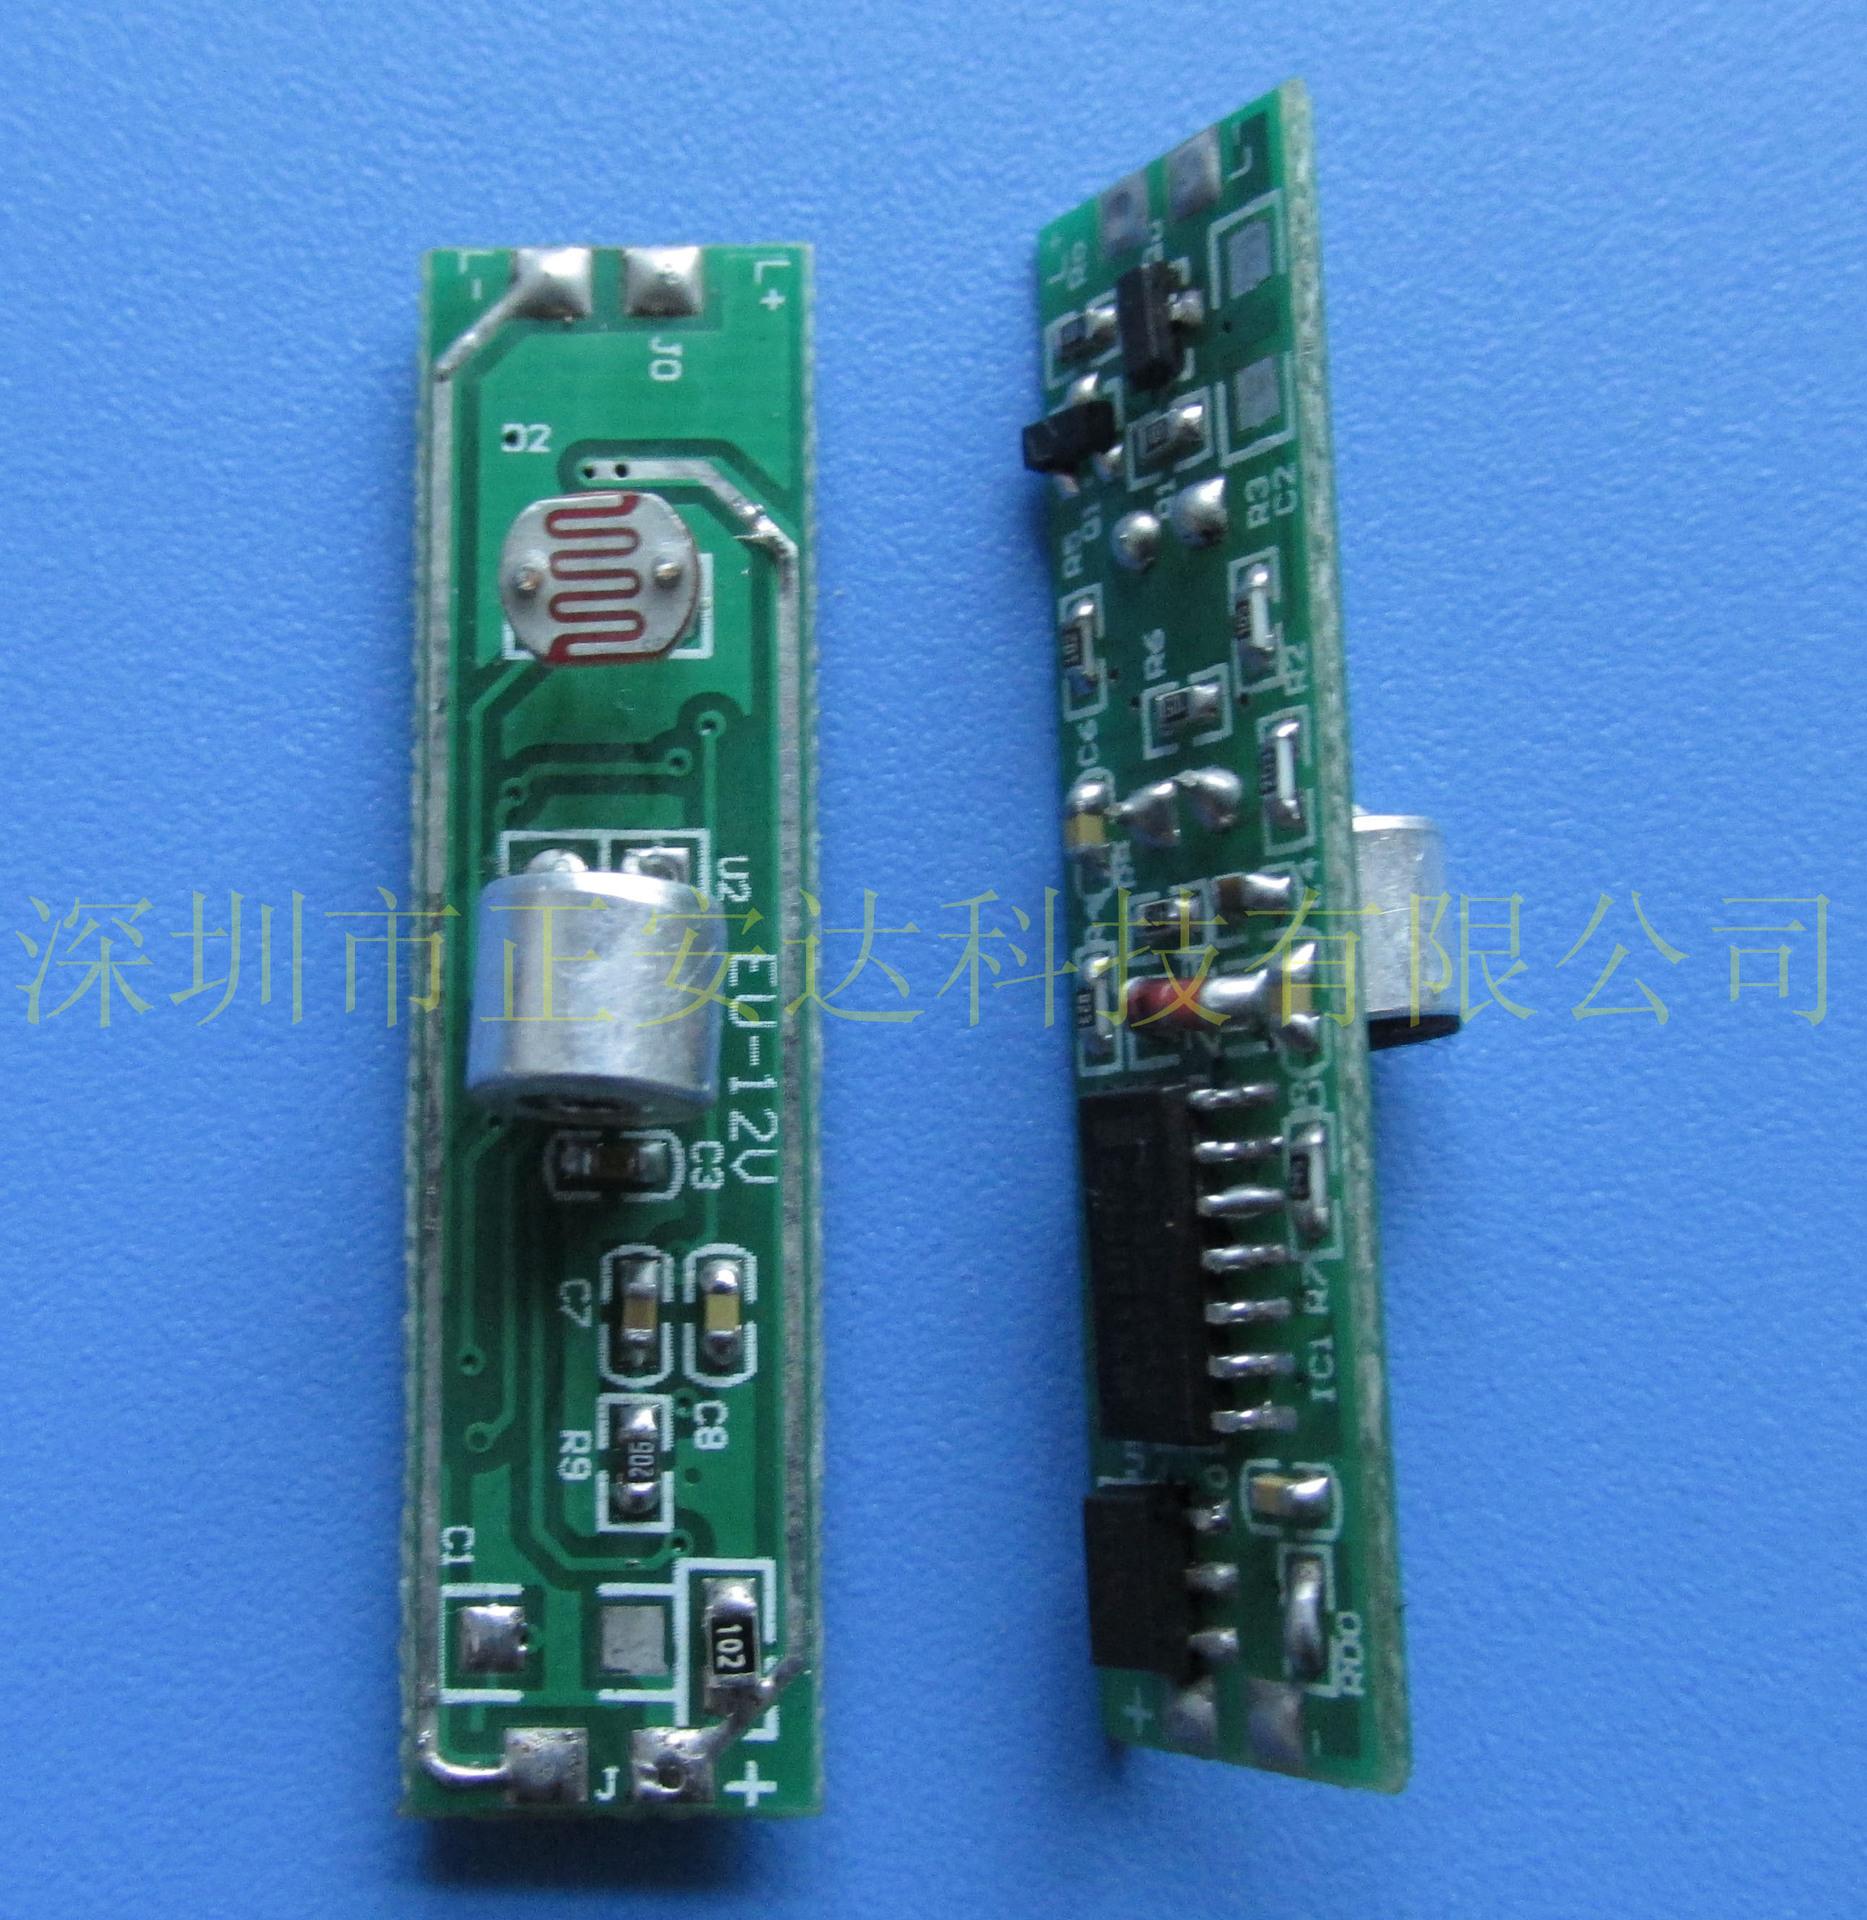 led声控器,楼道led声光控器,路灯led声控开关,小型声光控开关